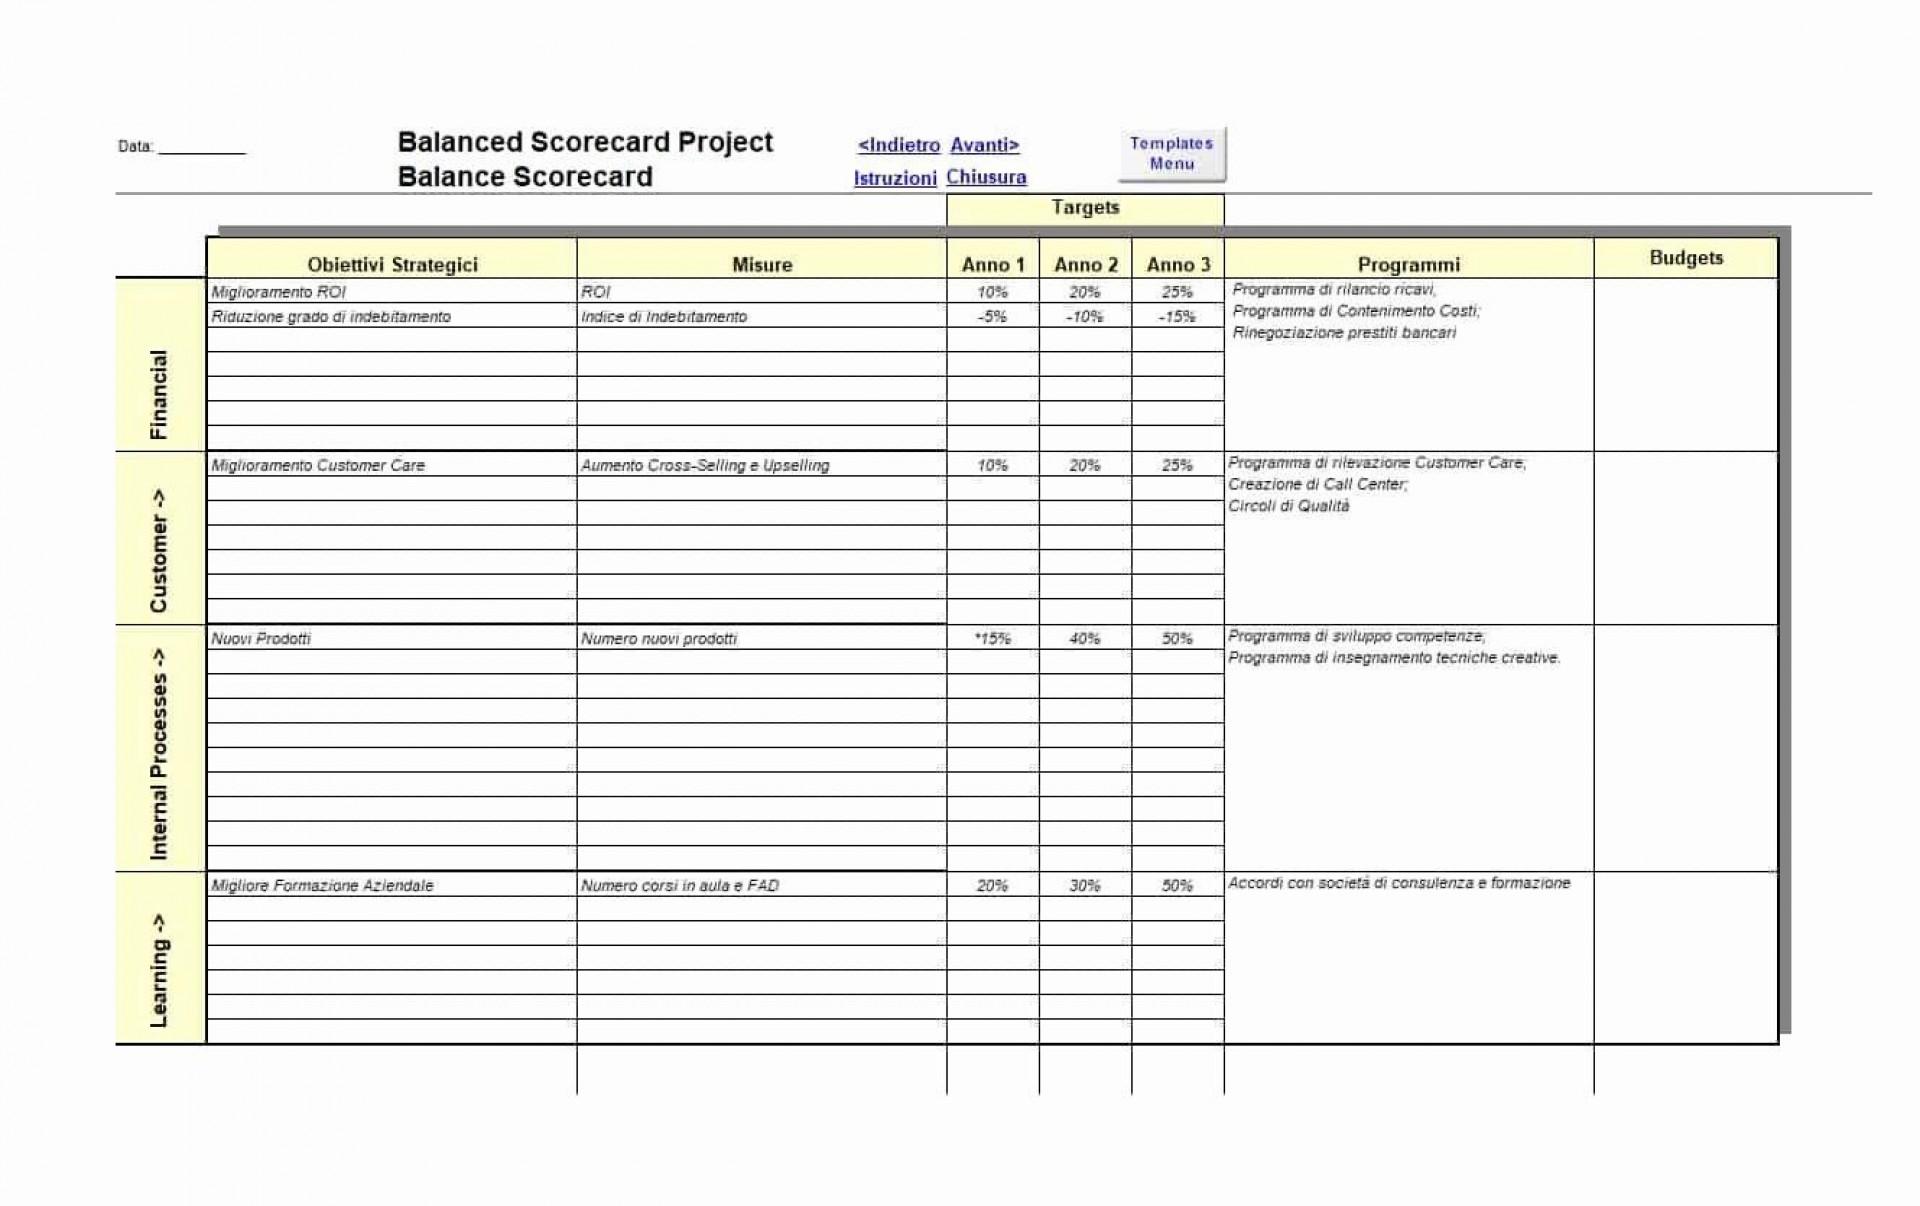 002 Awful Balanced Scorecard Excel Template Image  Dashboard Download Hr1920